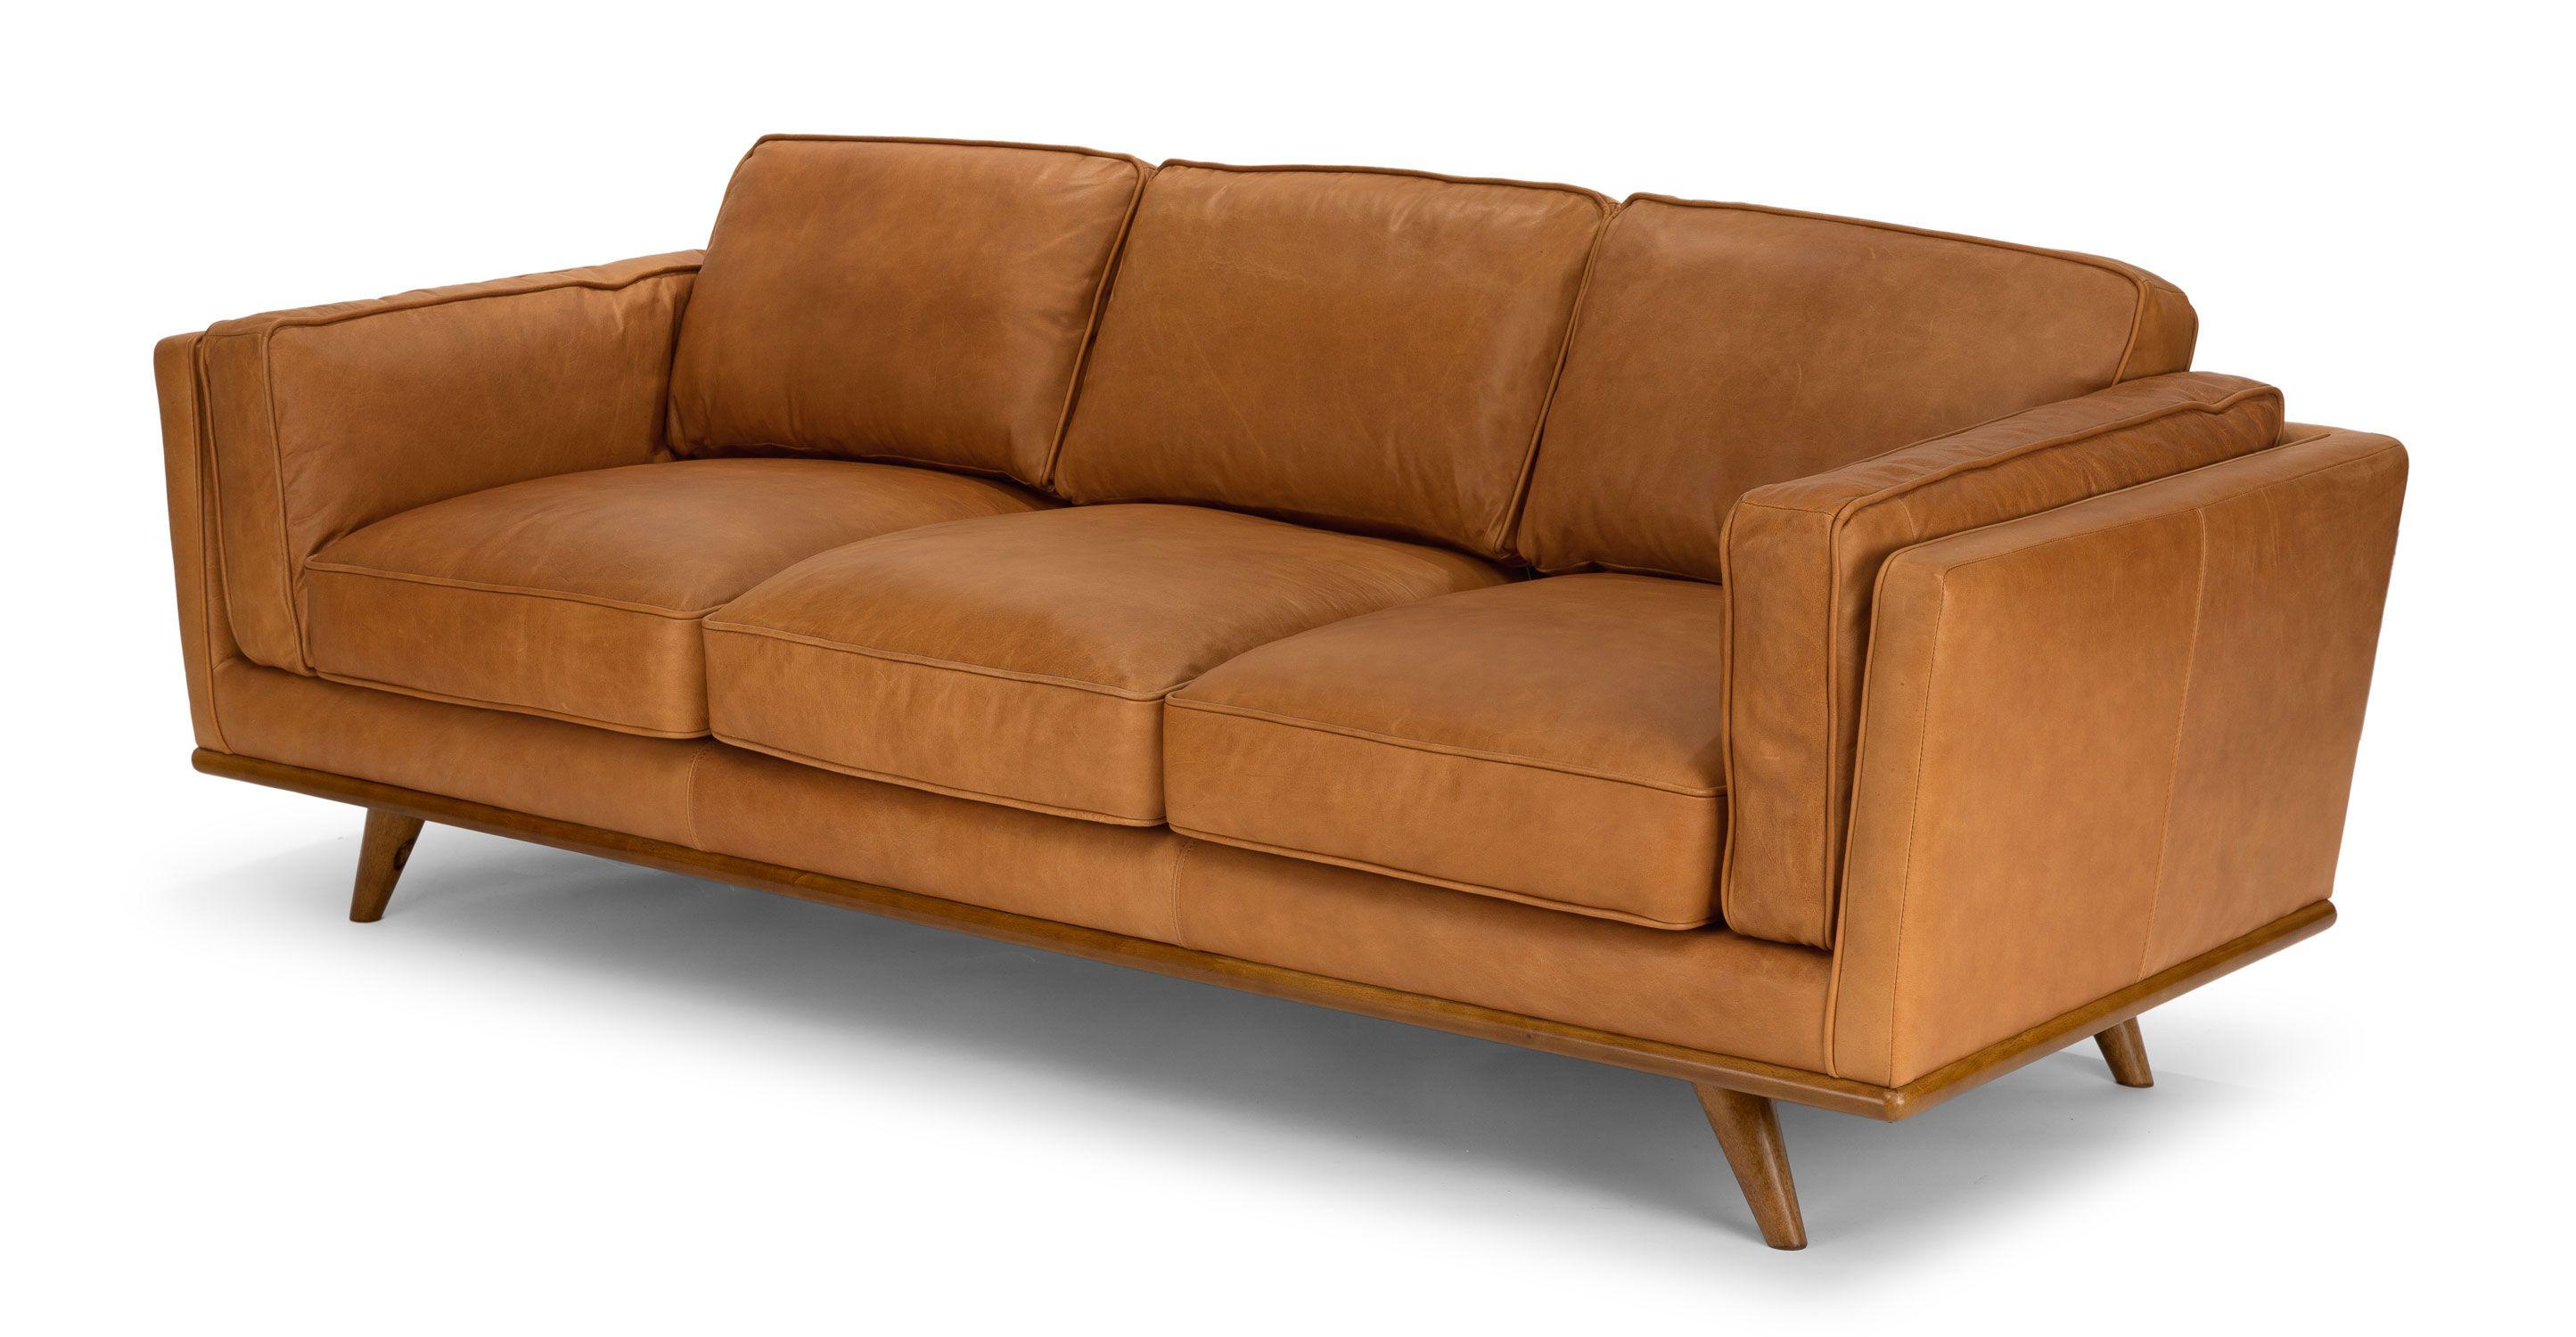 Timber Rain Cloud Gray Sofa Sofas Article